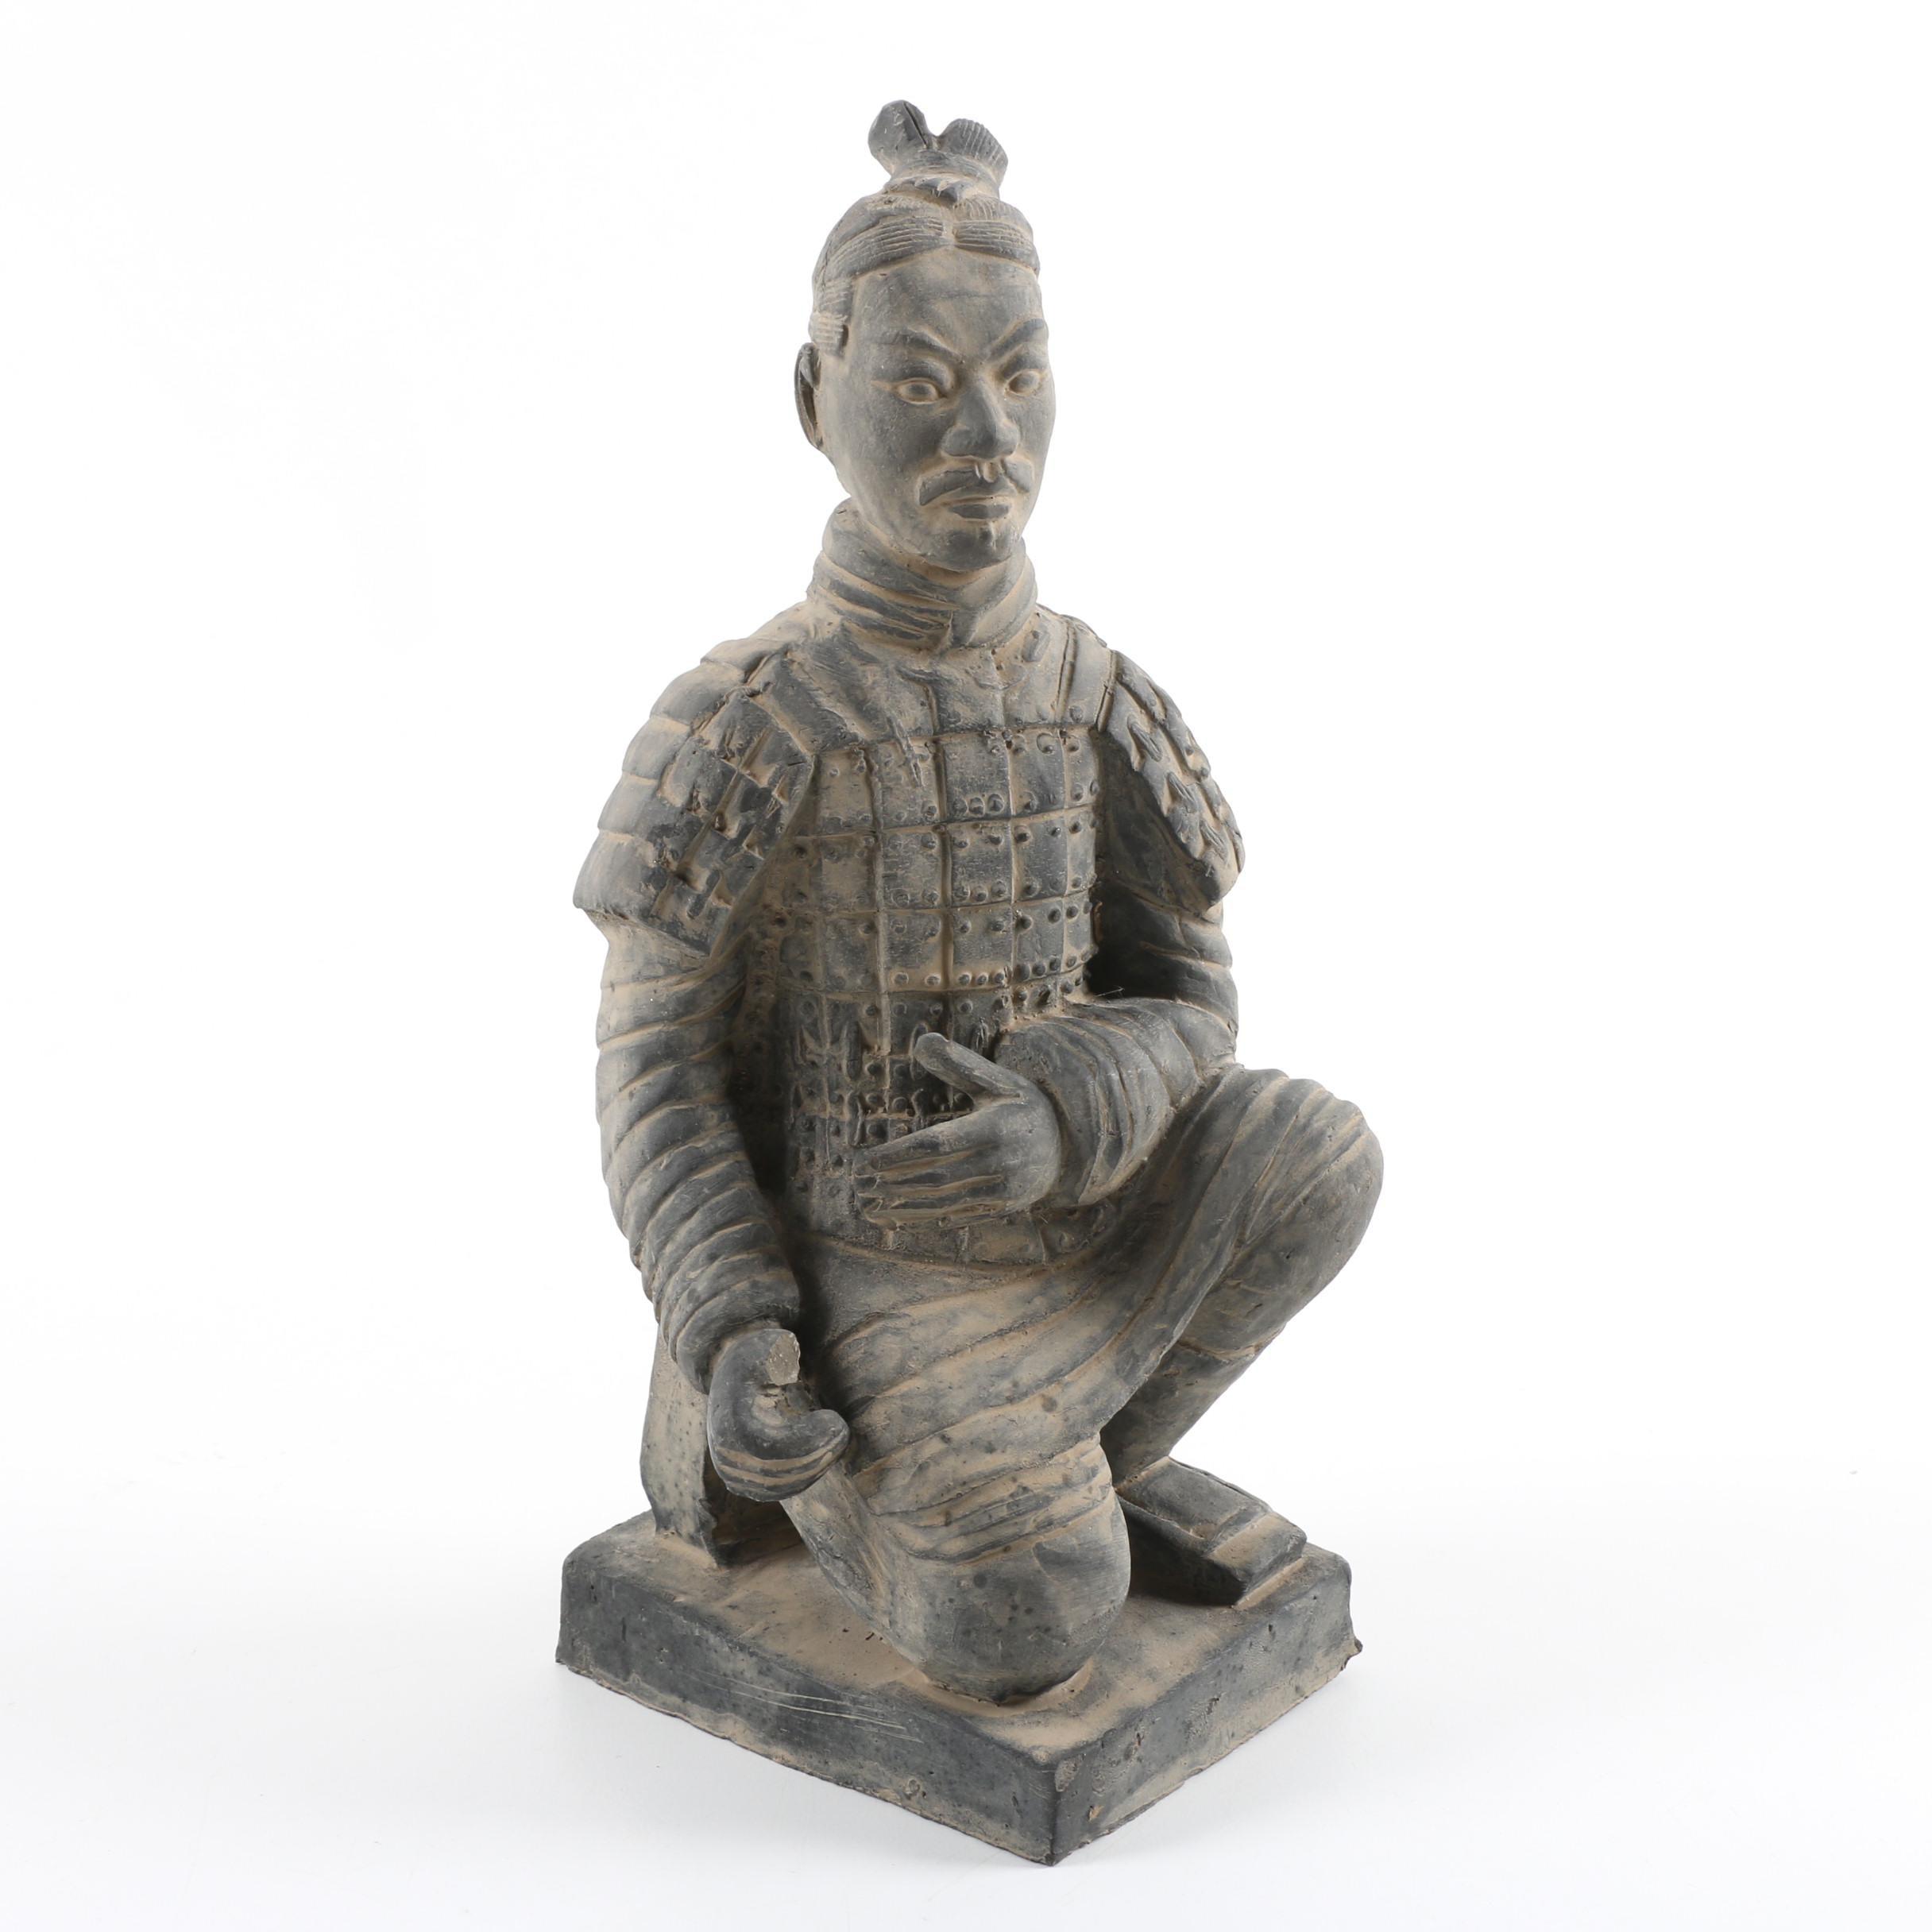 Chinese Replica Terracotta Warrior Figurine